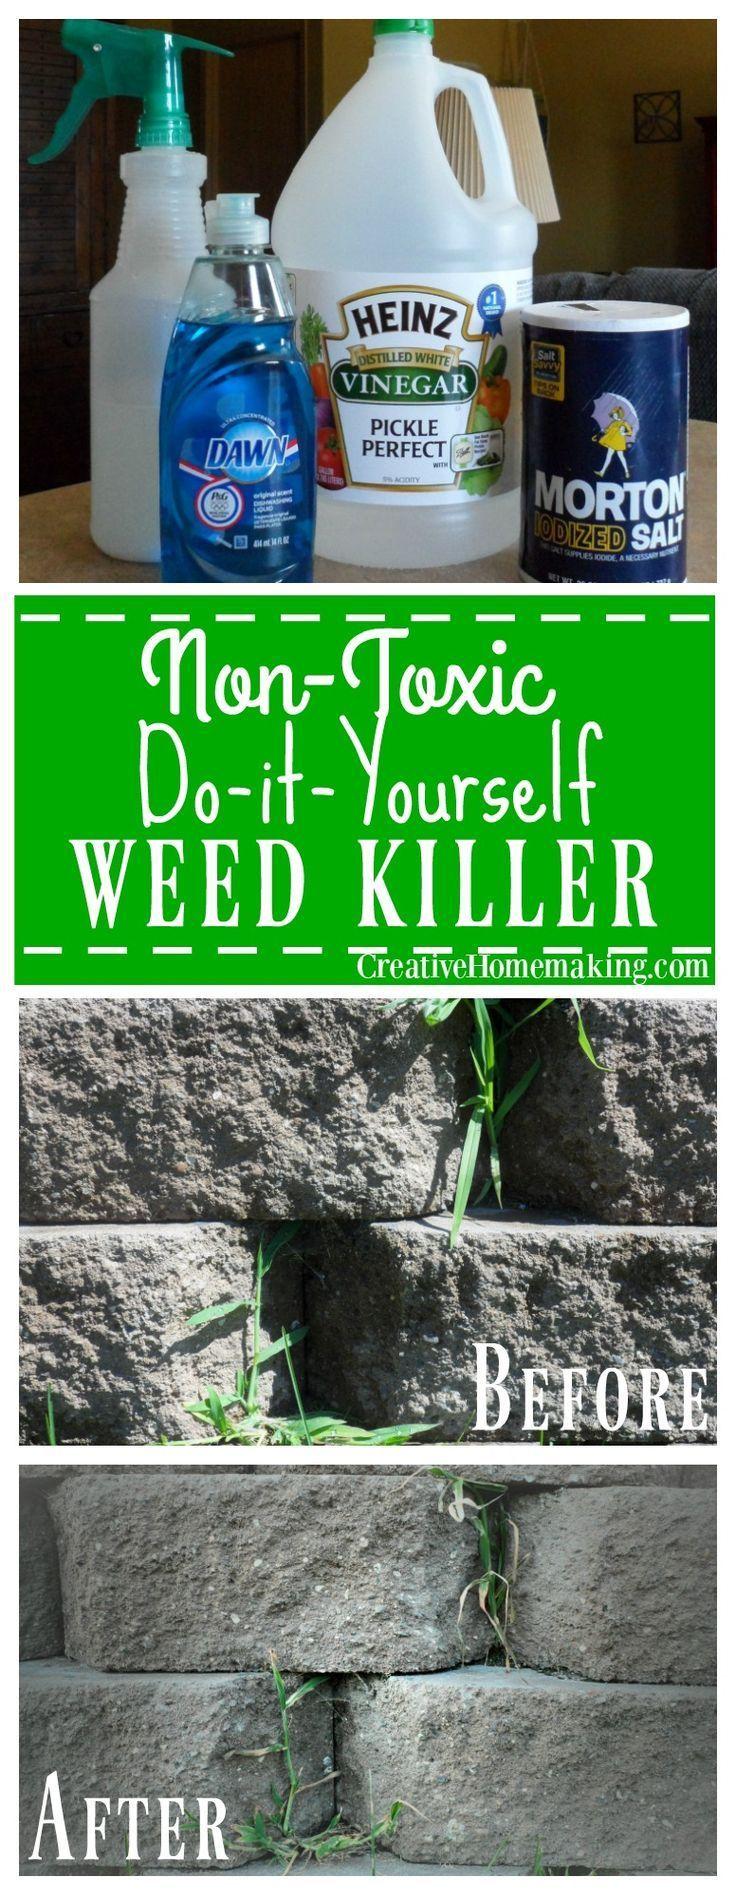 Weeds in flower beds herbicide - Weeds In Flower Beds Herbicide 21